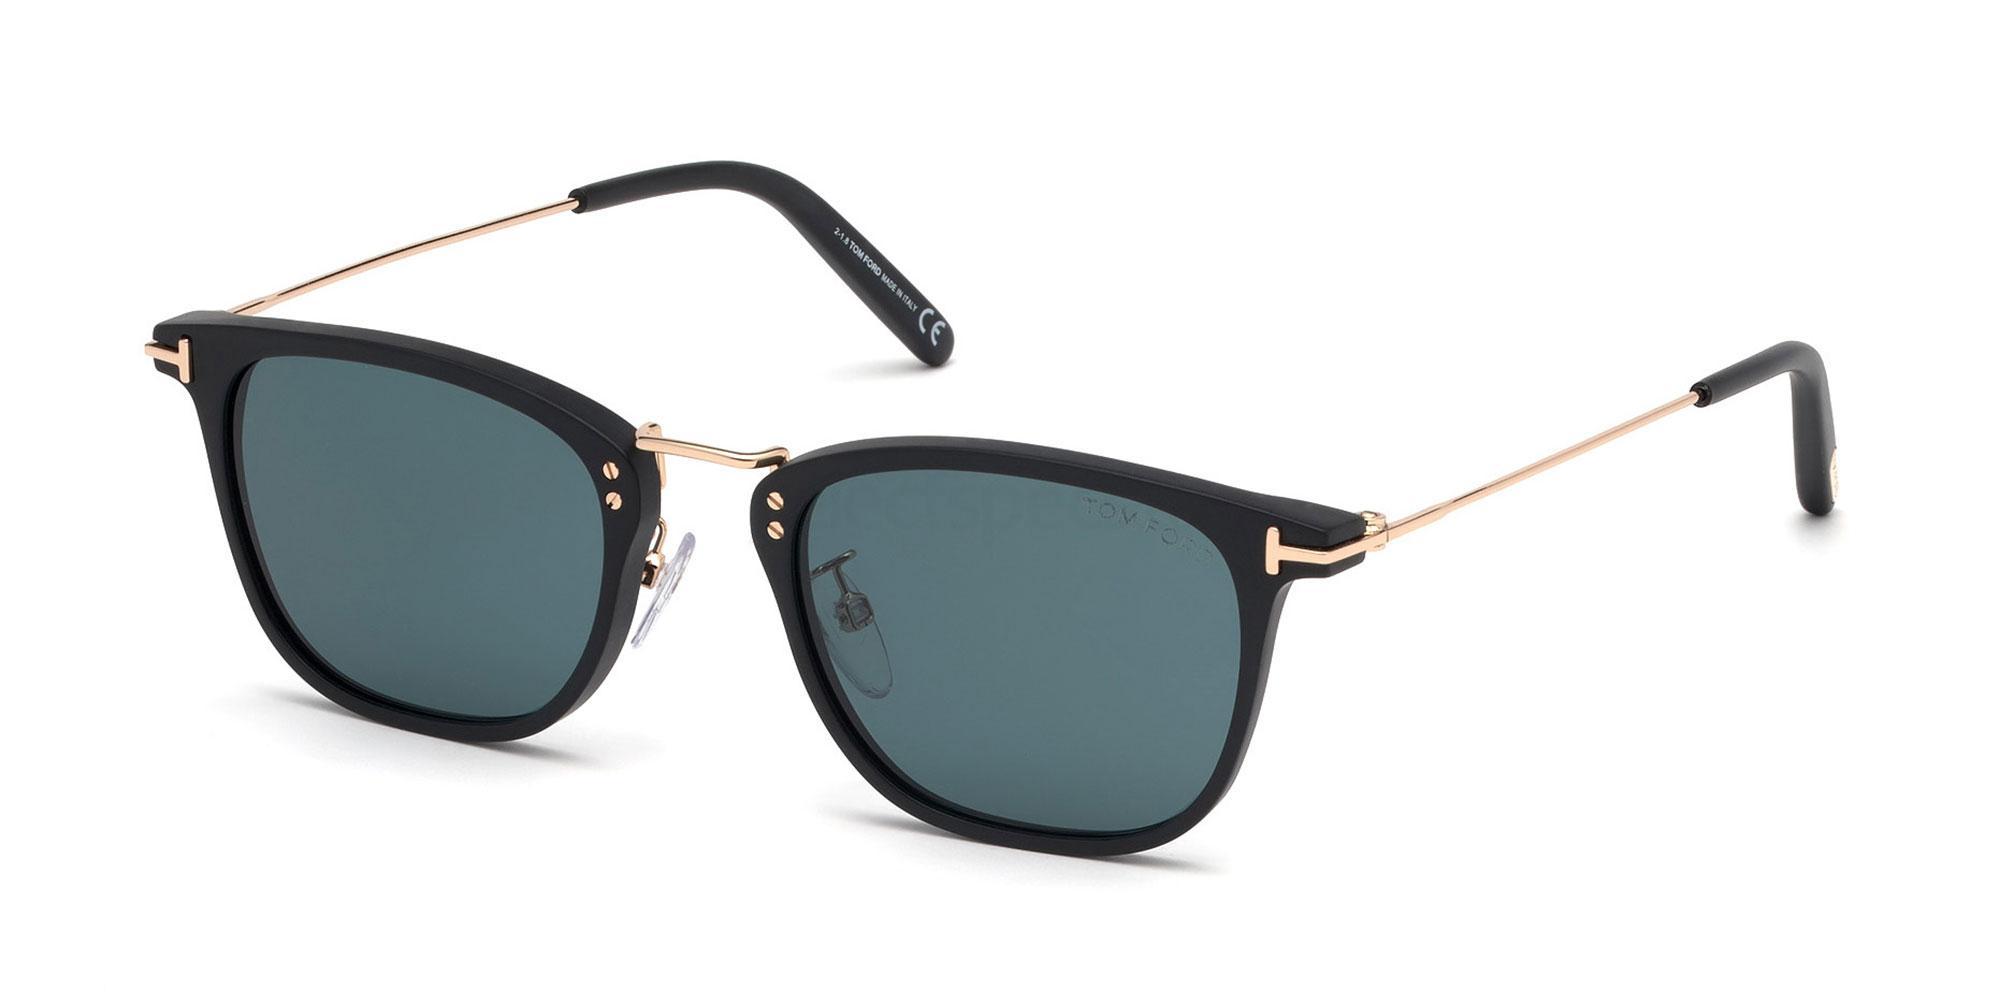 02N FT0672 Sunglasses, Tom Ford